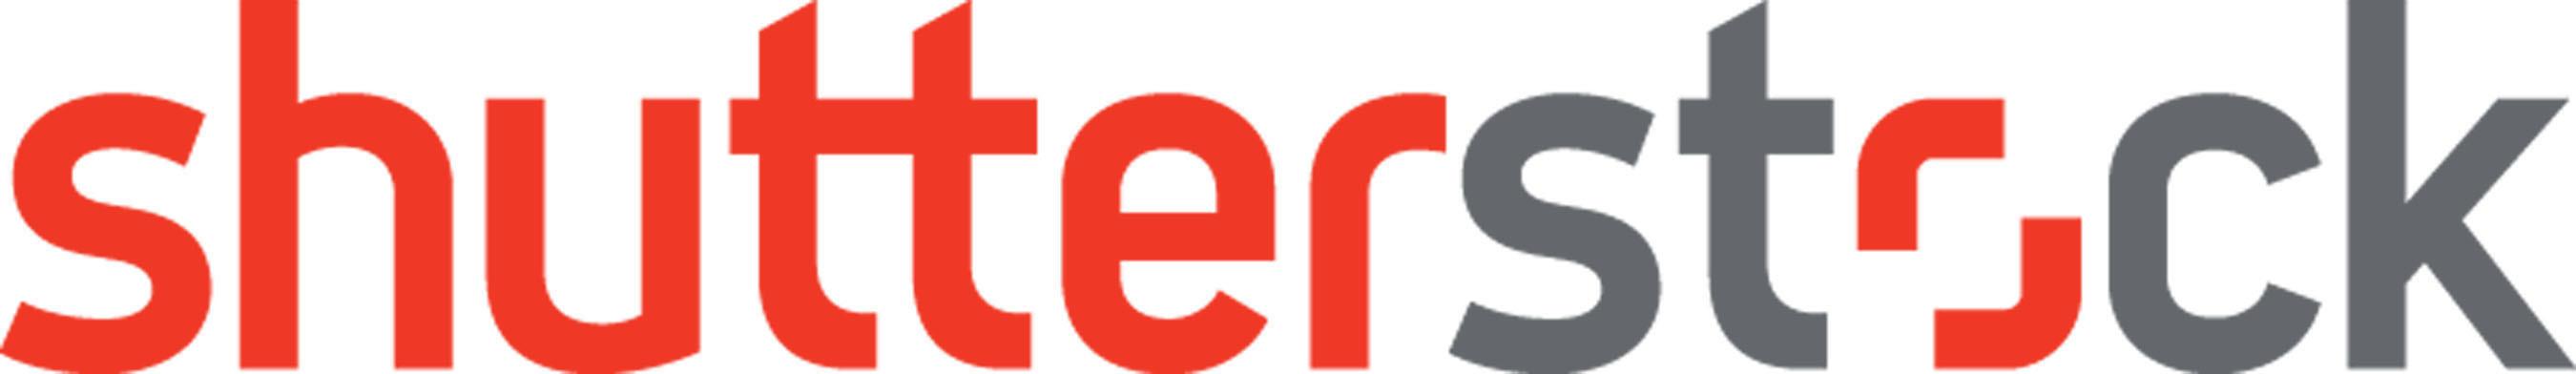 Shutterstock BR